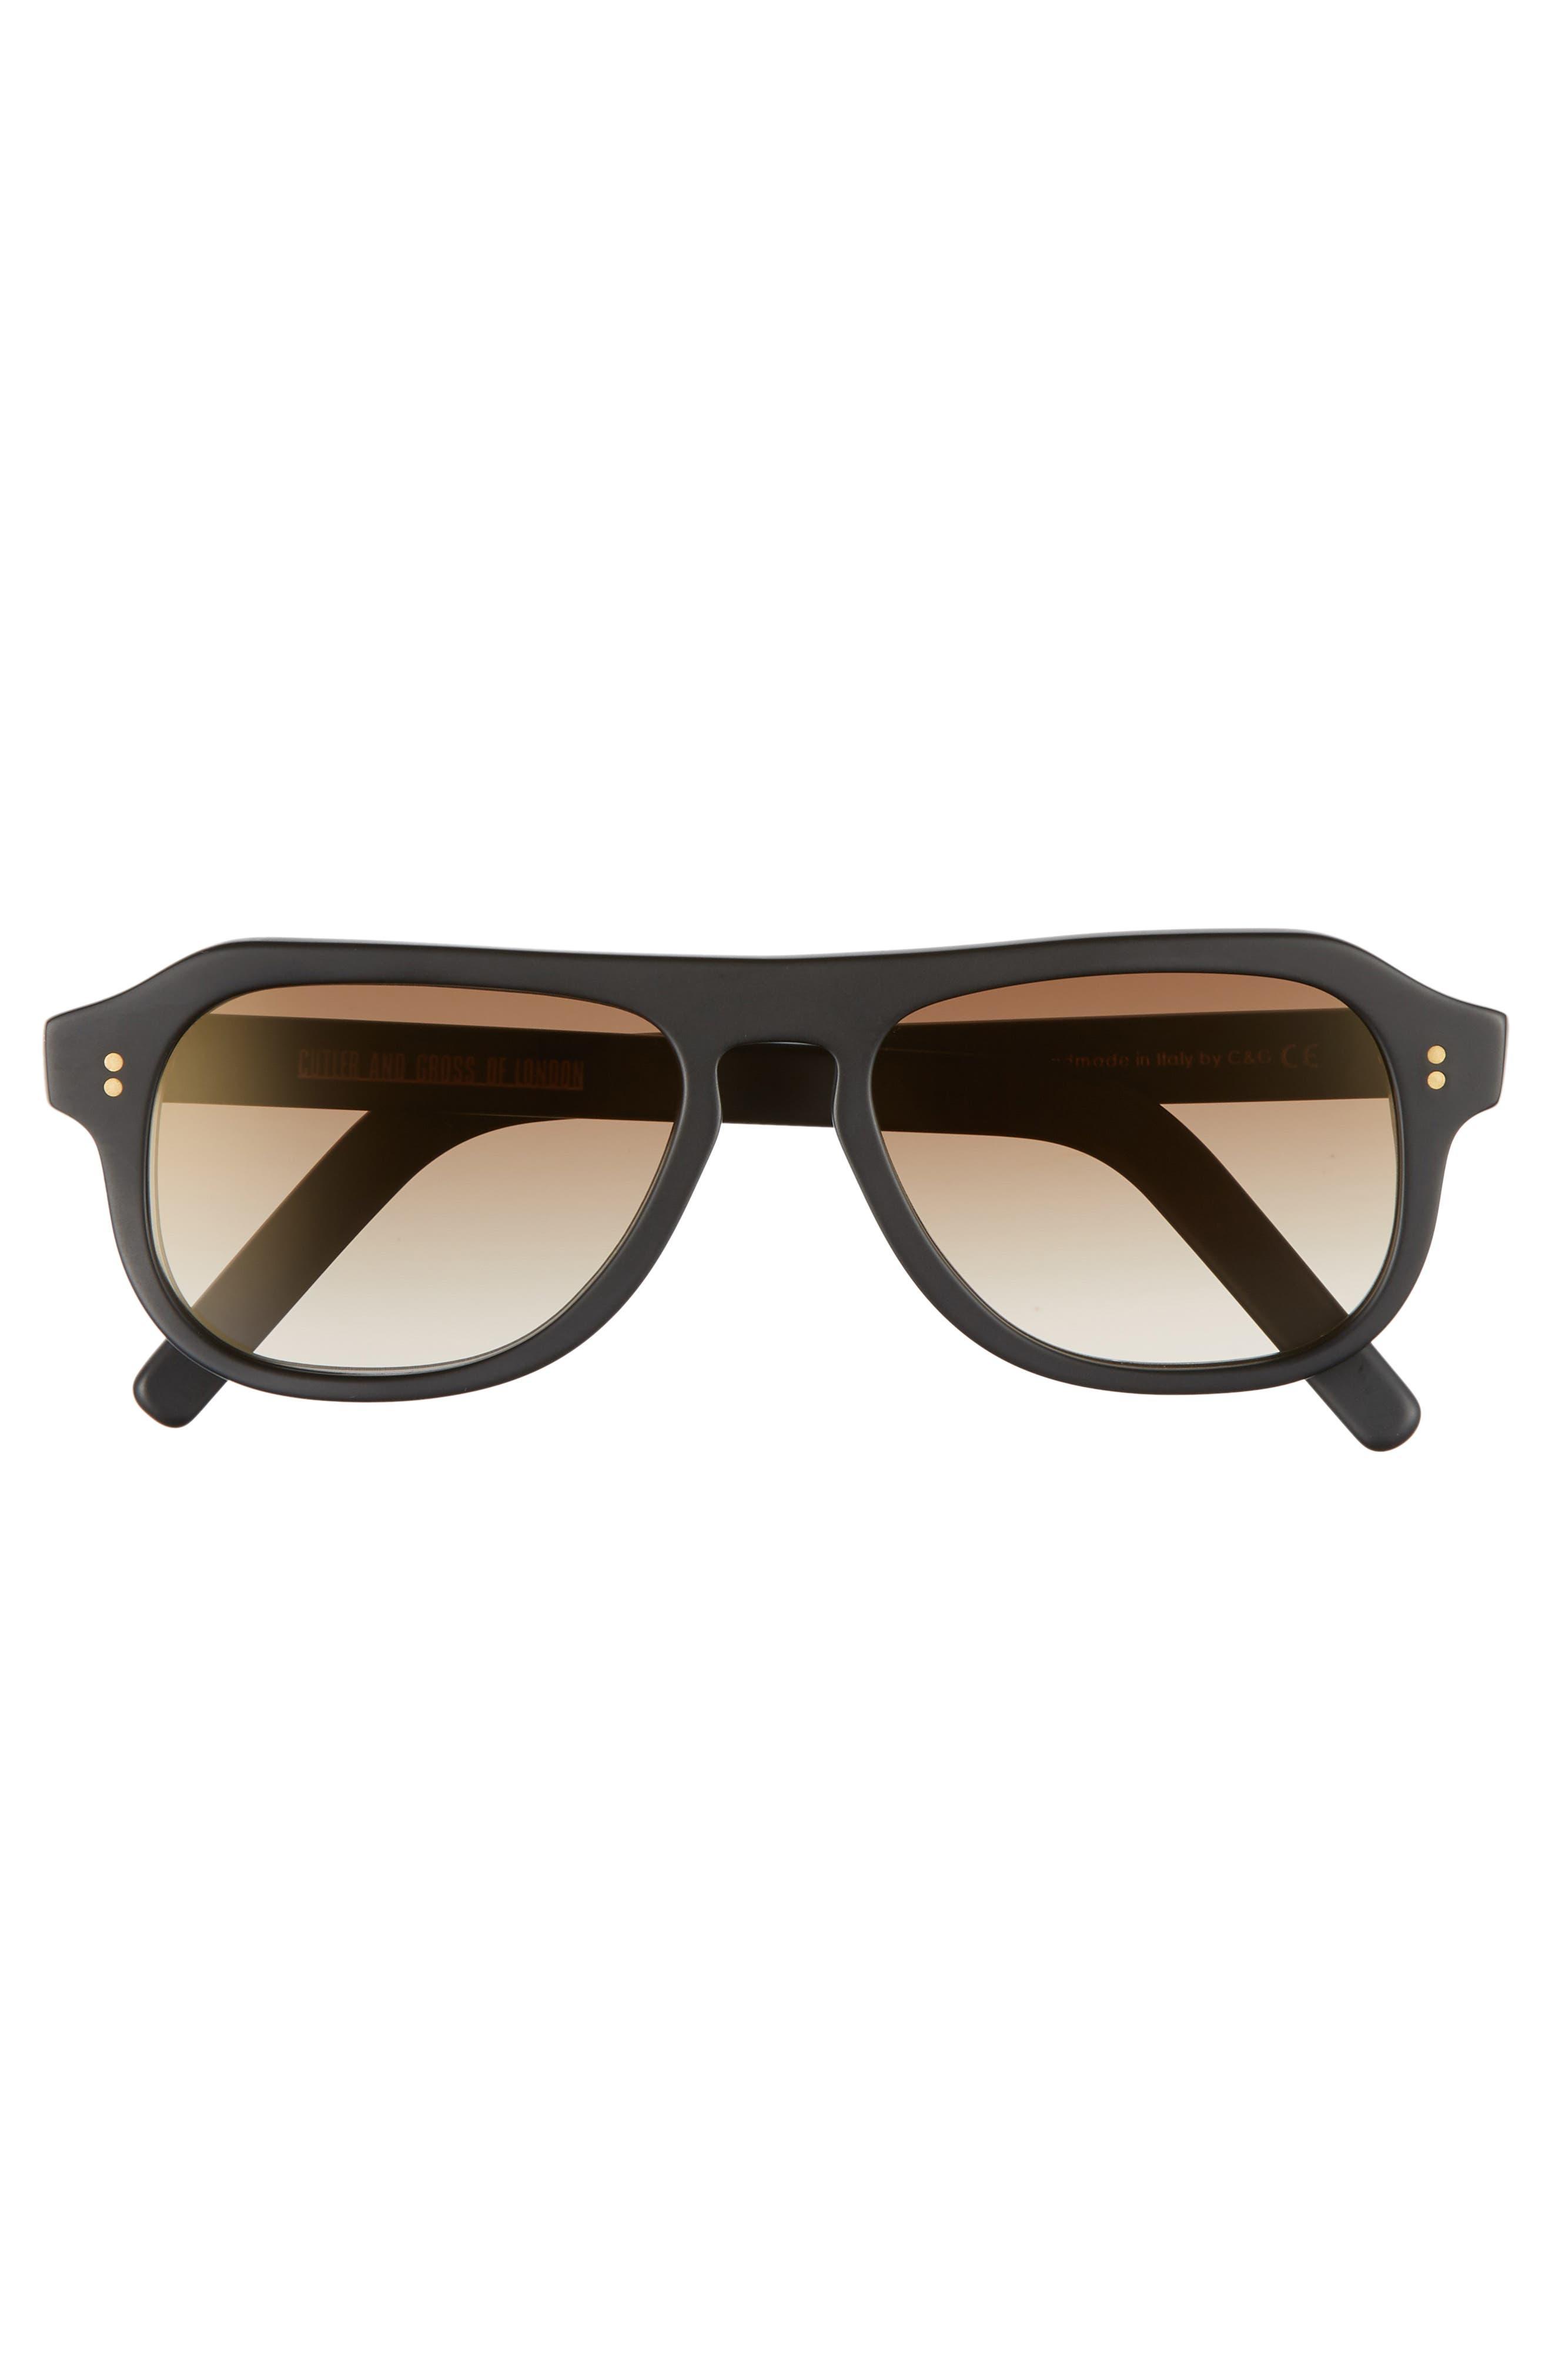 53mm Polarized Sunglasses,                             Alternate thumbnail 2, color,                             MATTE BLACK/ BROWN